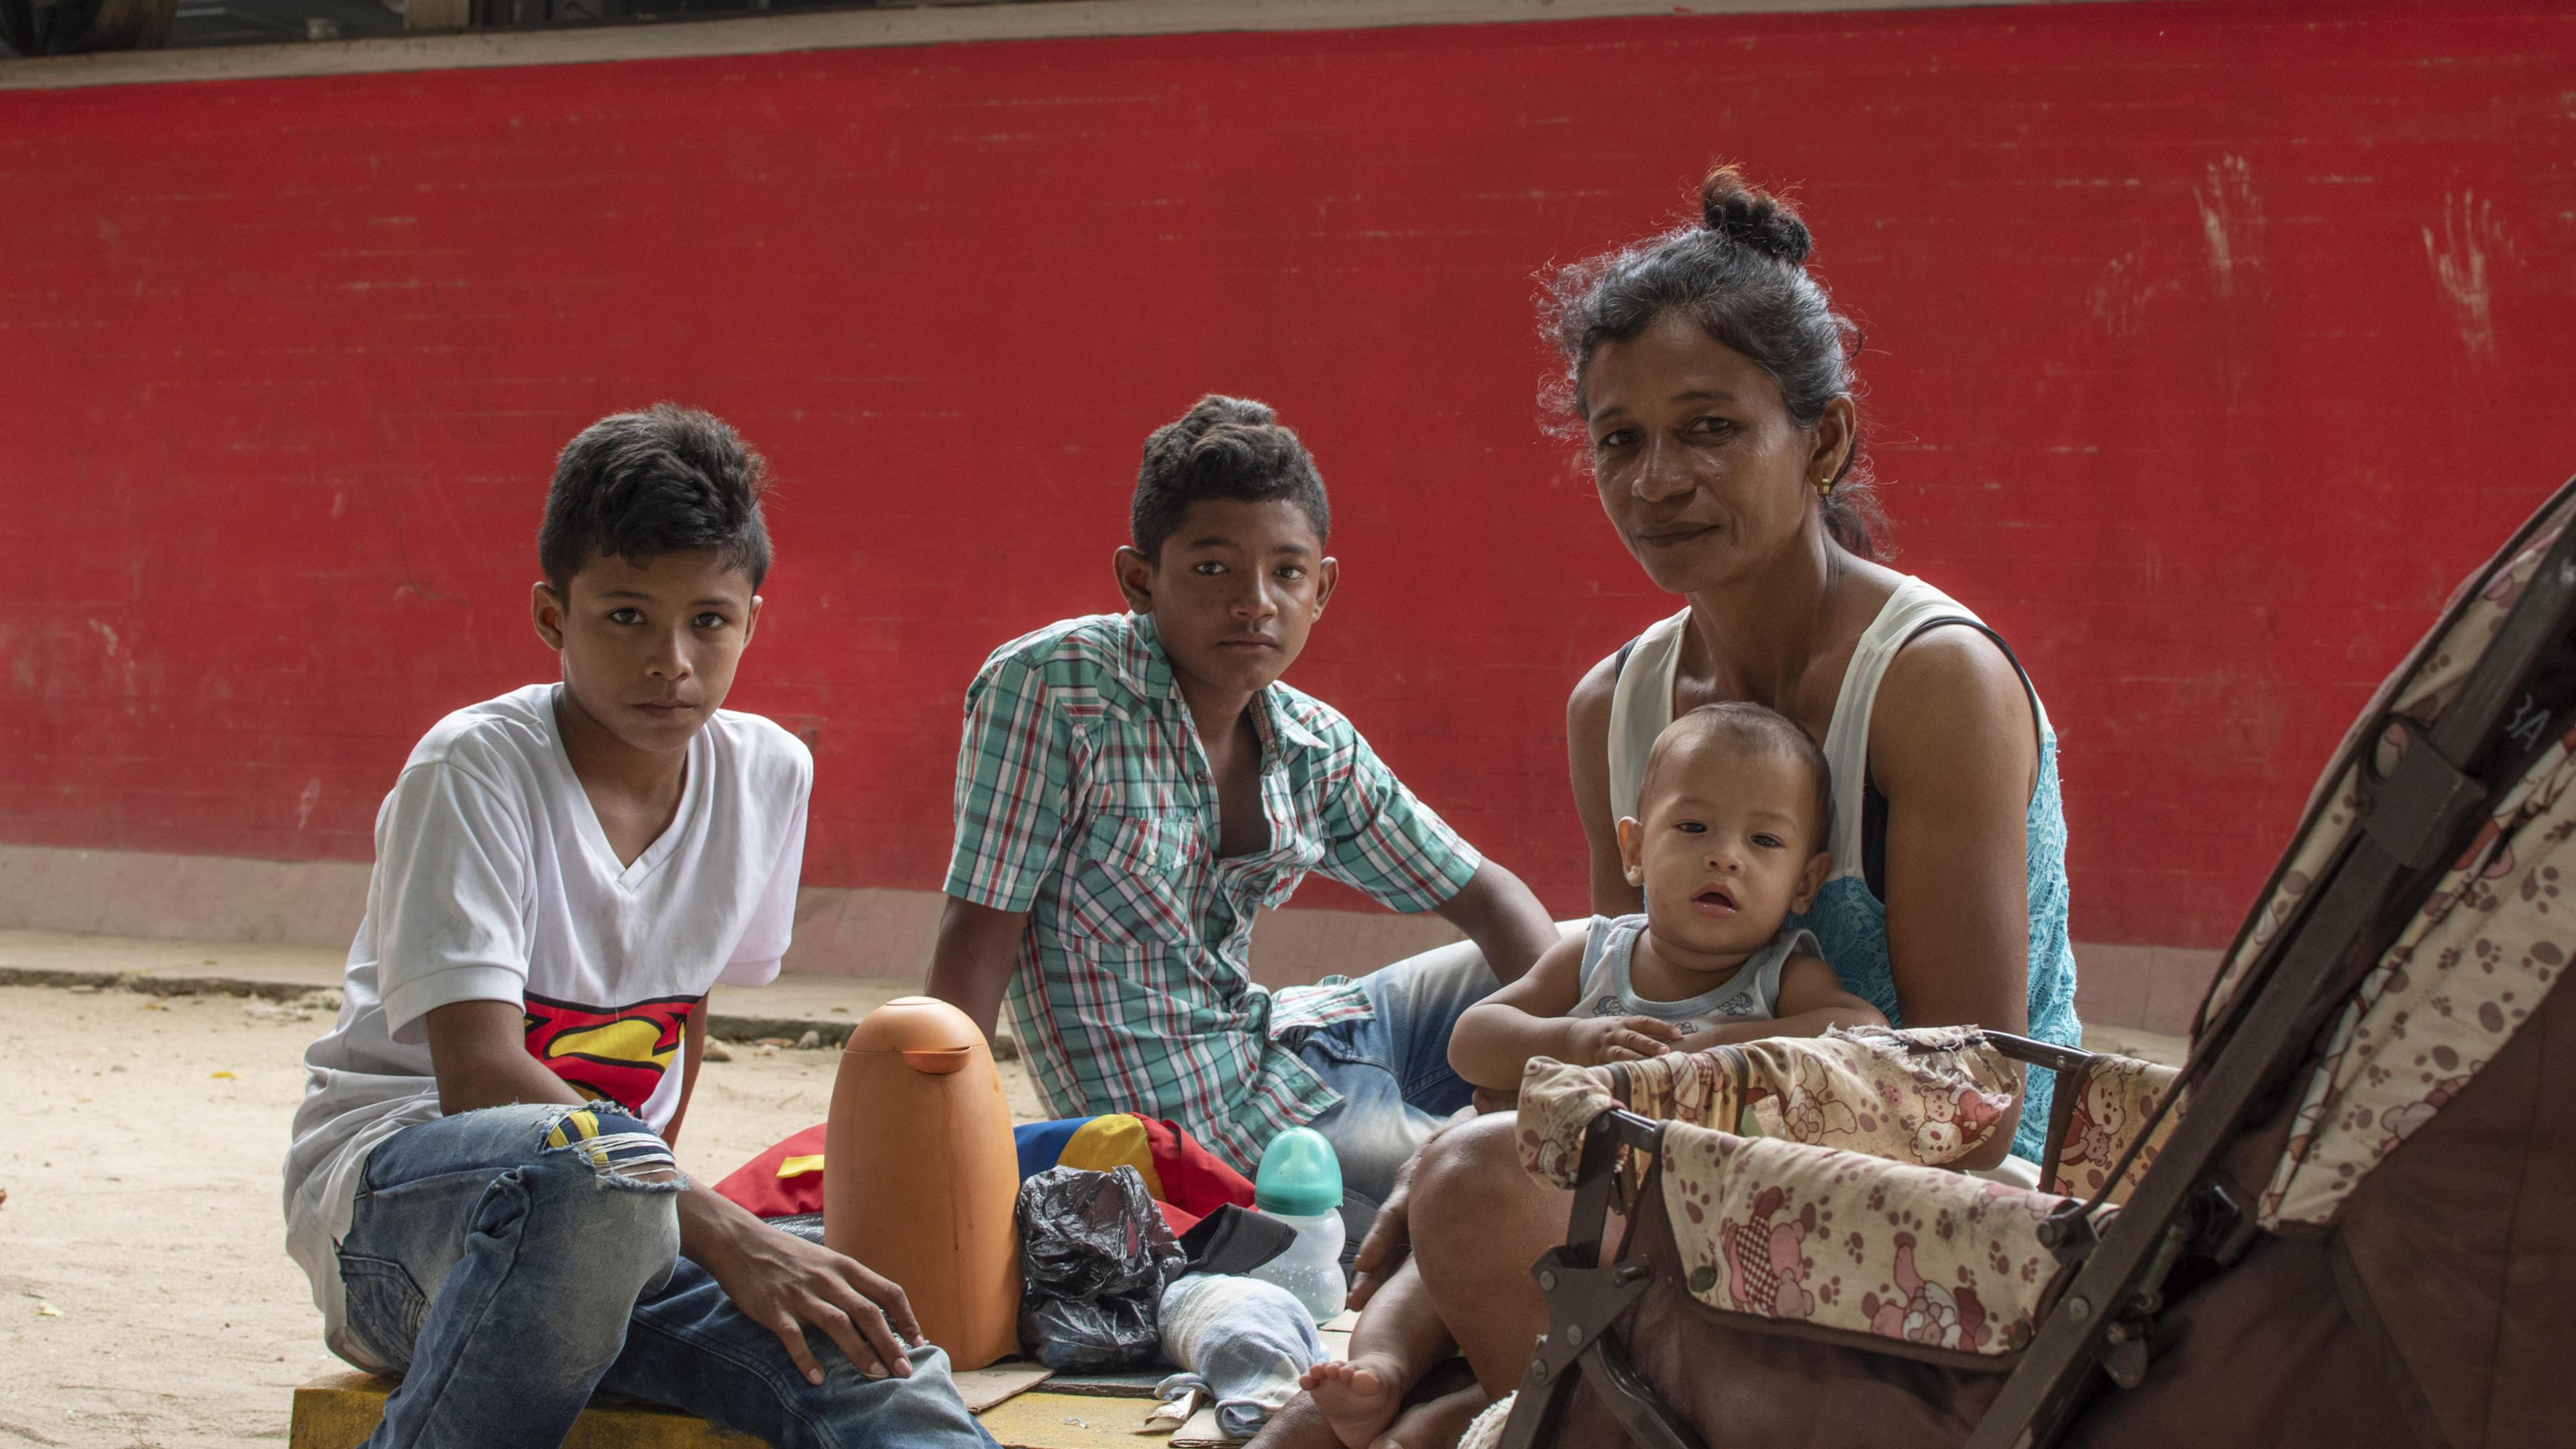 Protecting Children From Instability >> Venezuela S Hidden Crisis Its Children S Unknown Futures